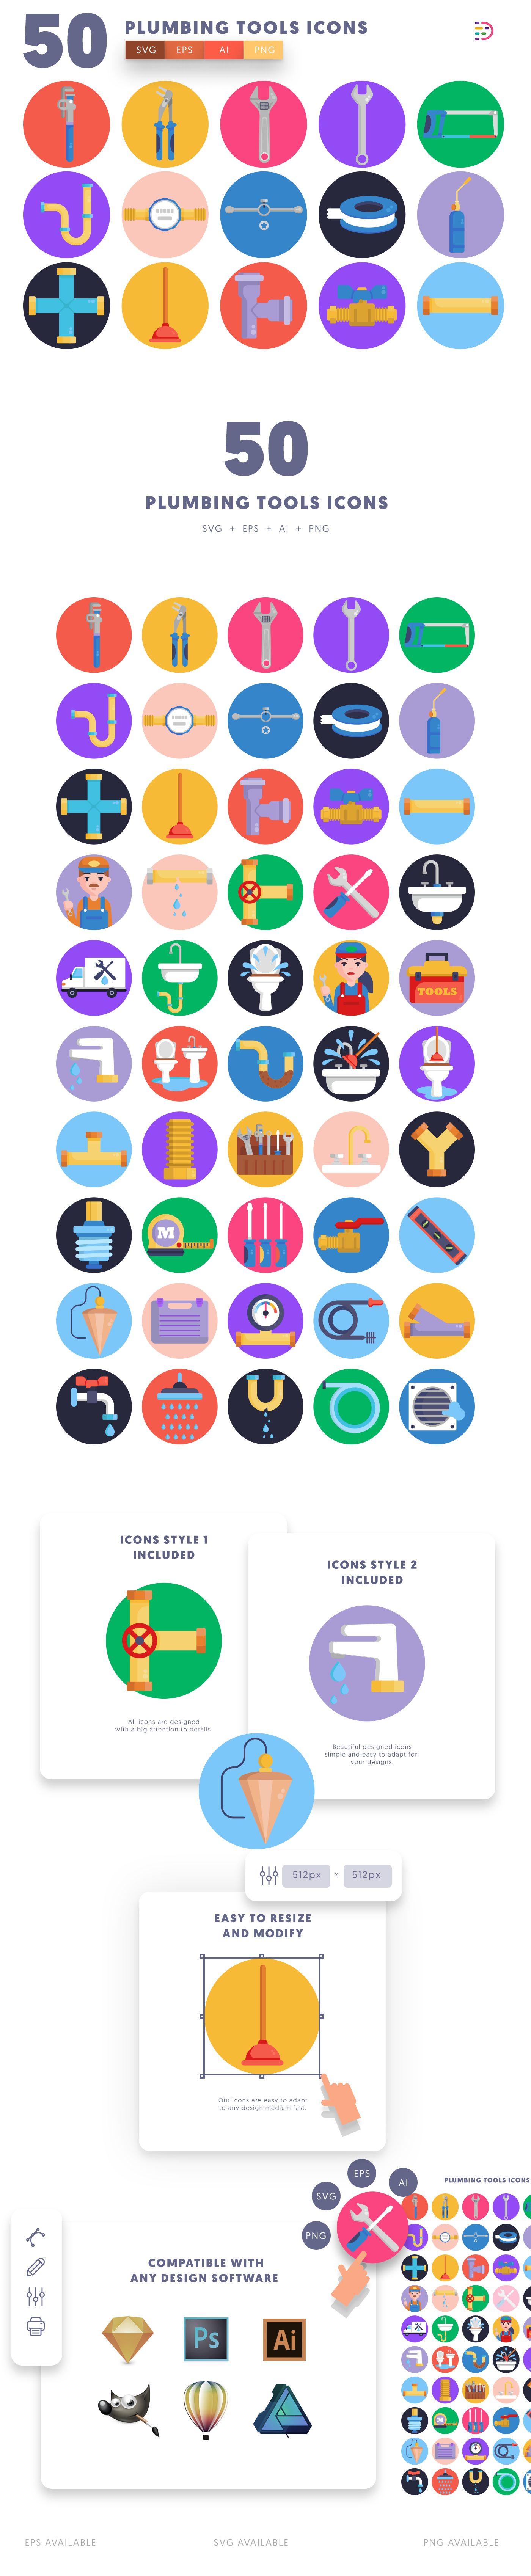 Plumbing Tools icons info graphic